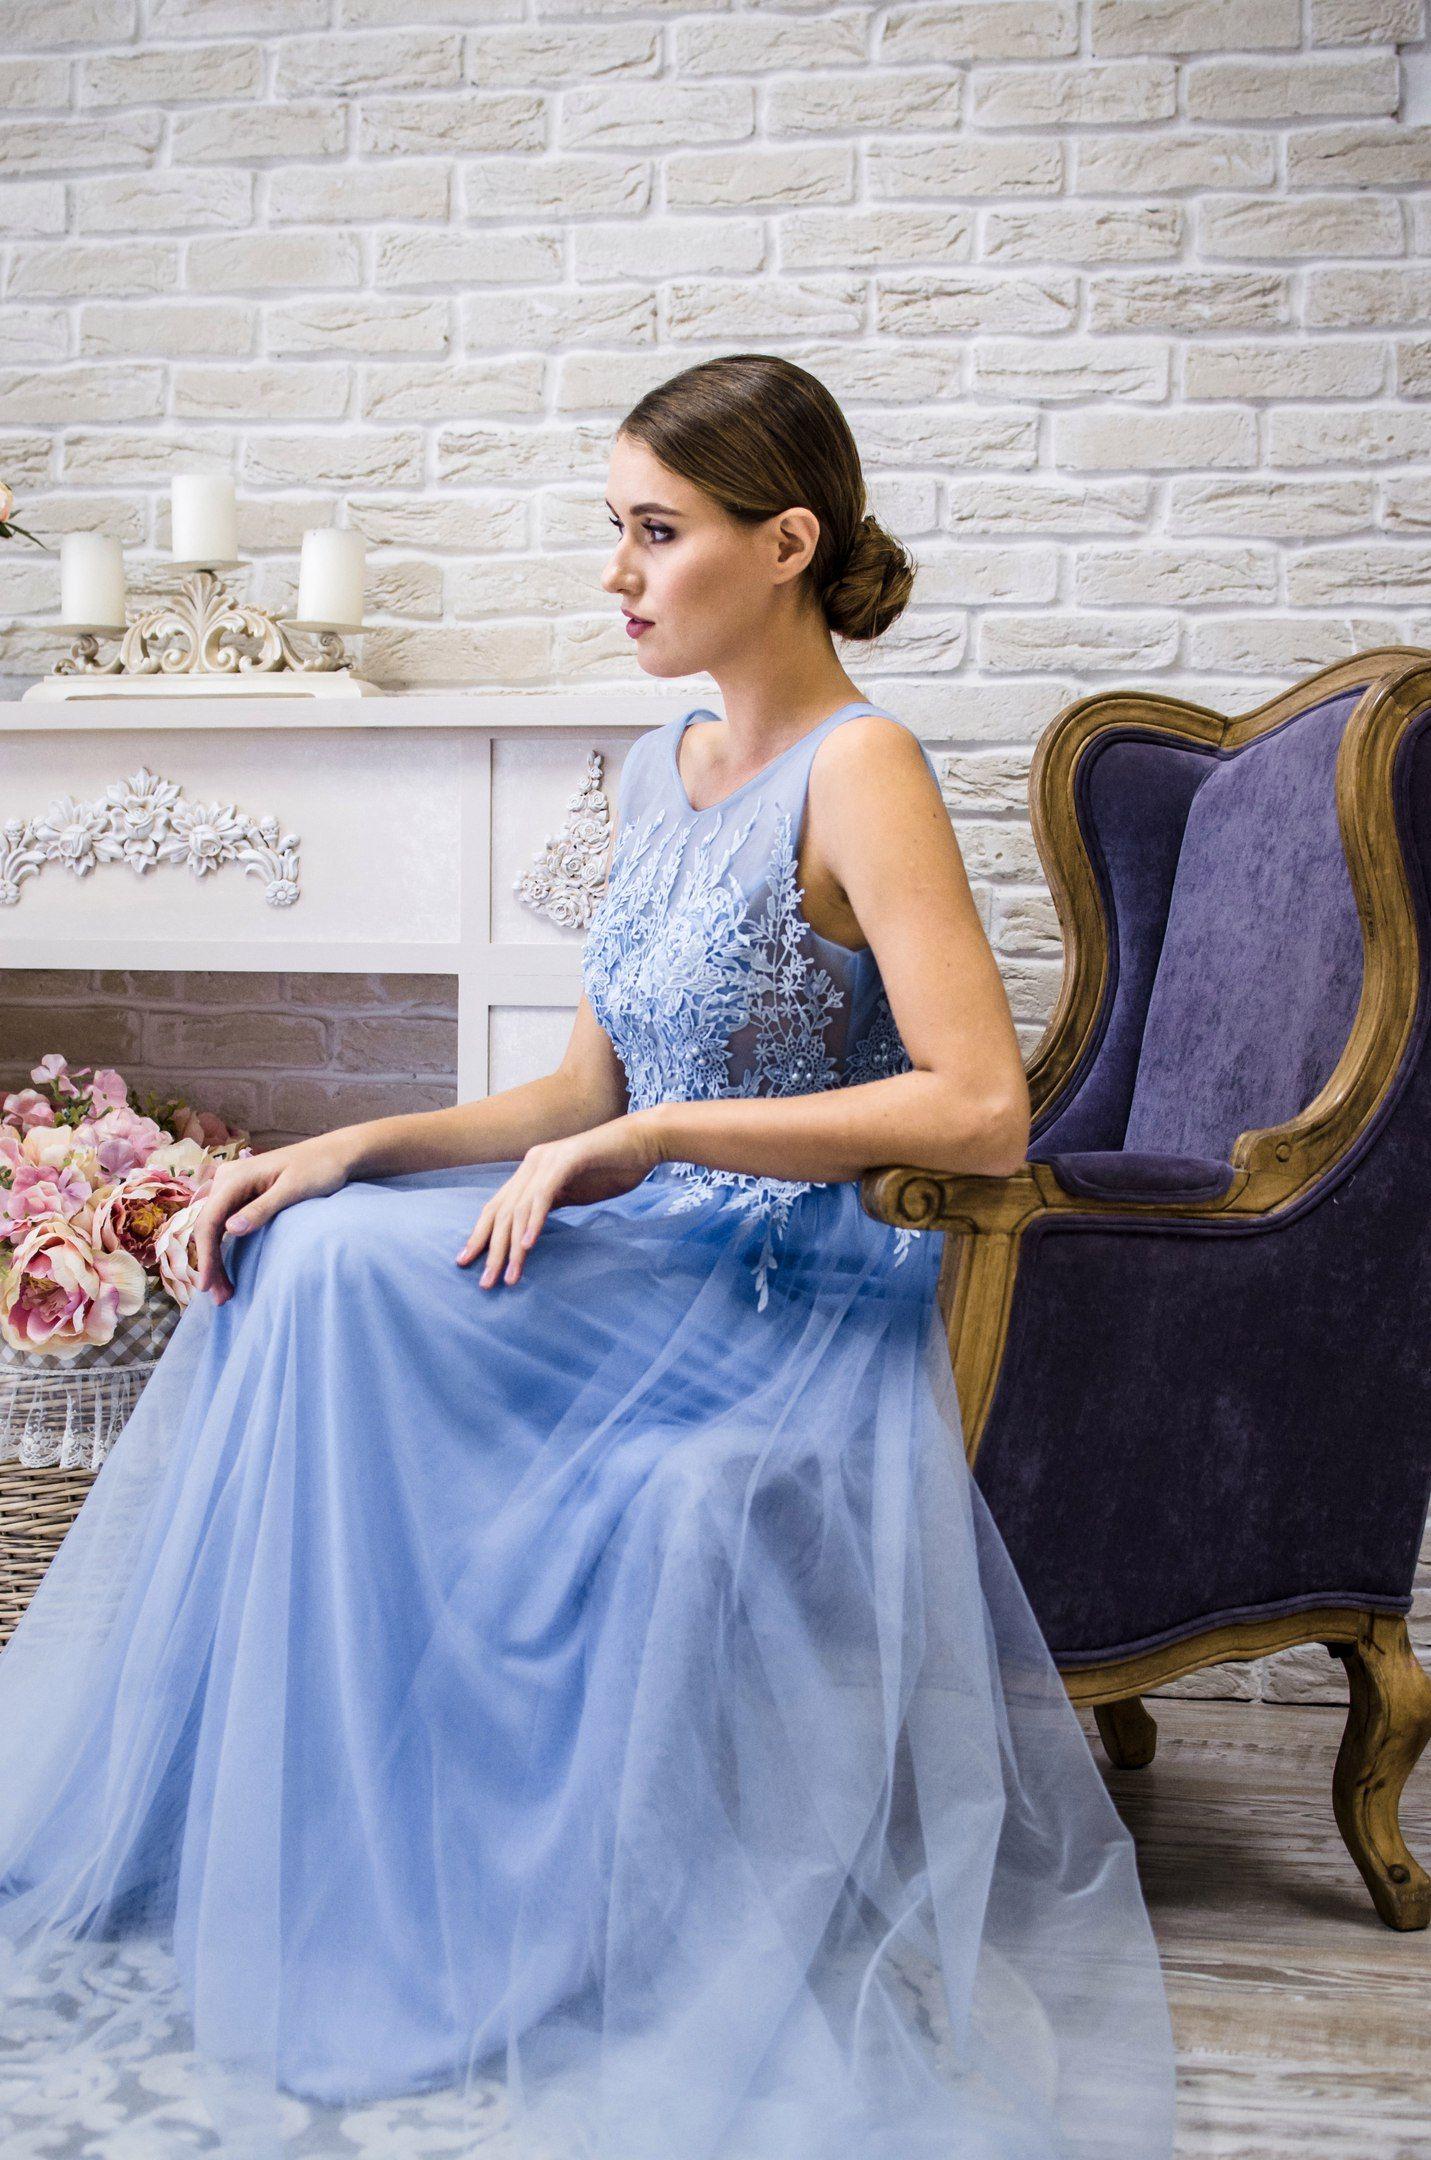 dfc2e862025 Прекрасное платье